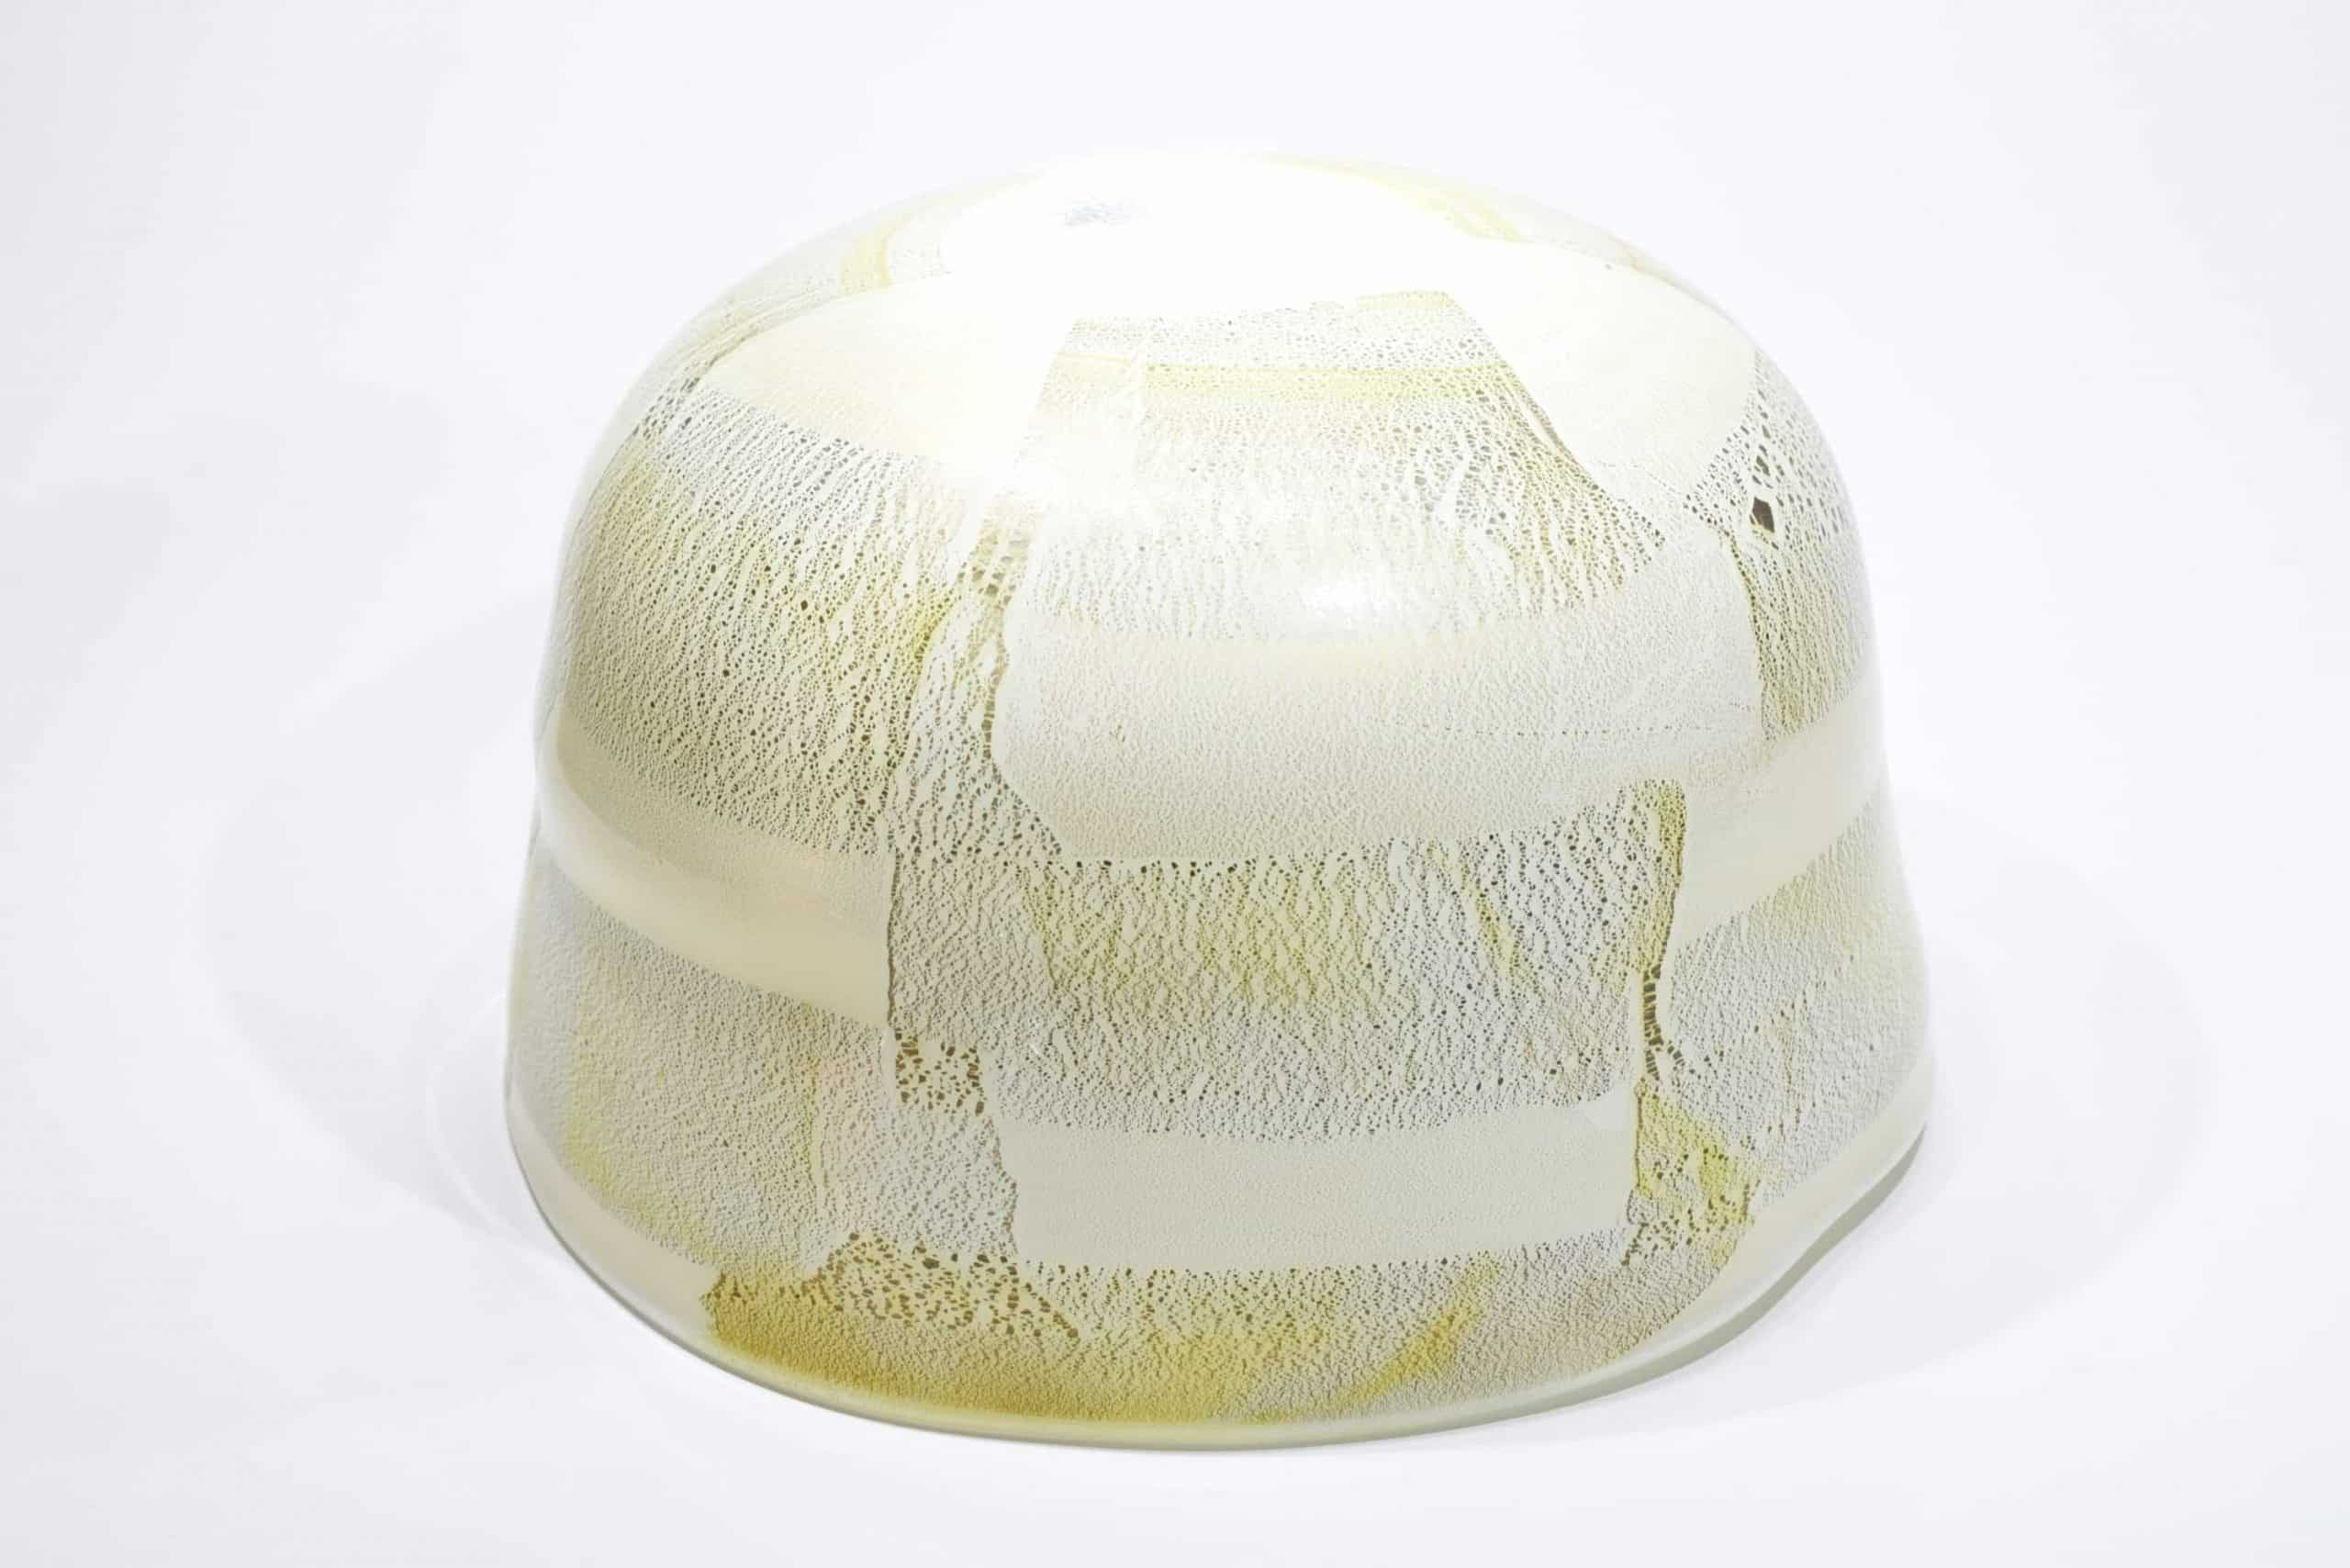 Herzstück aus Muranoglas Blattgold